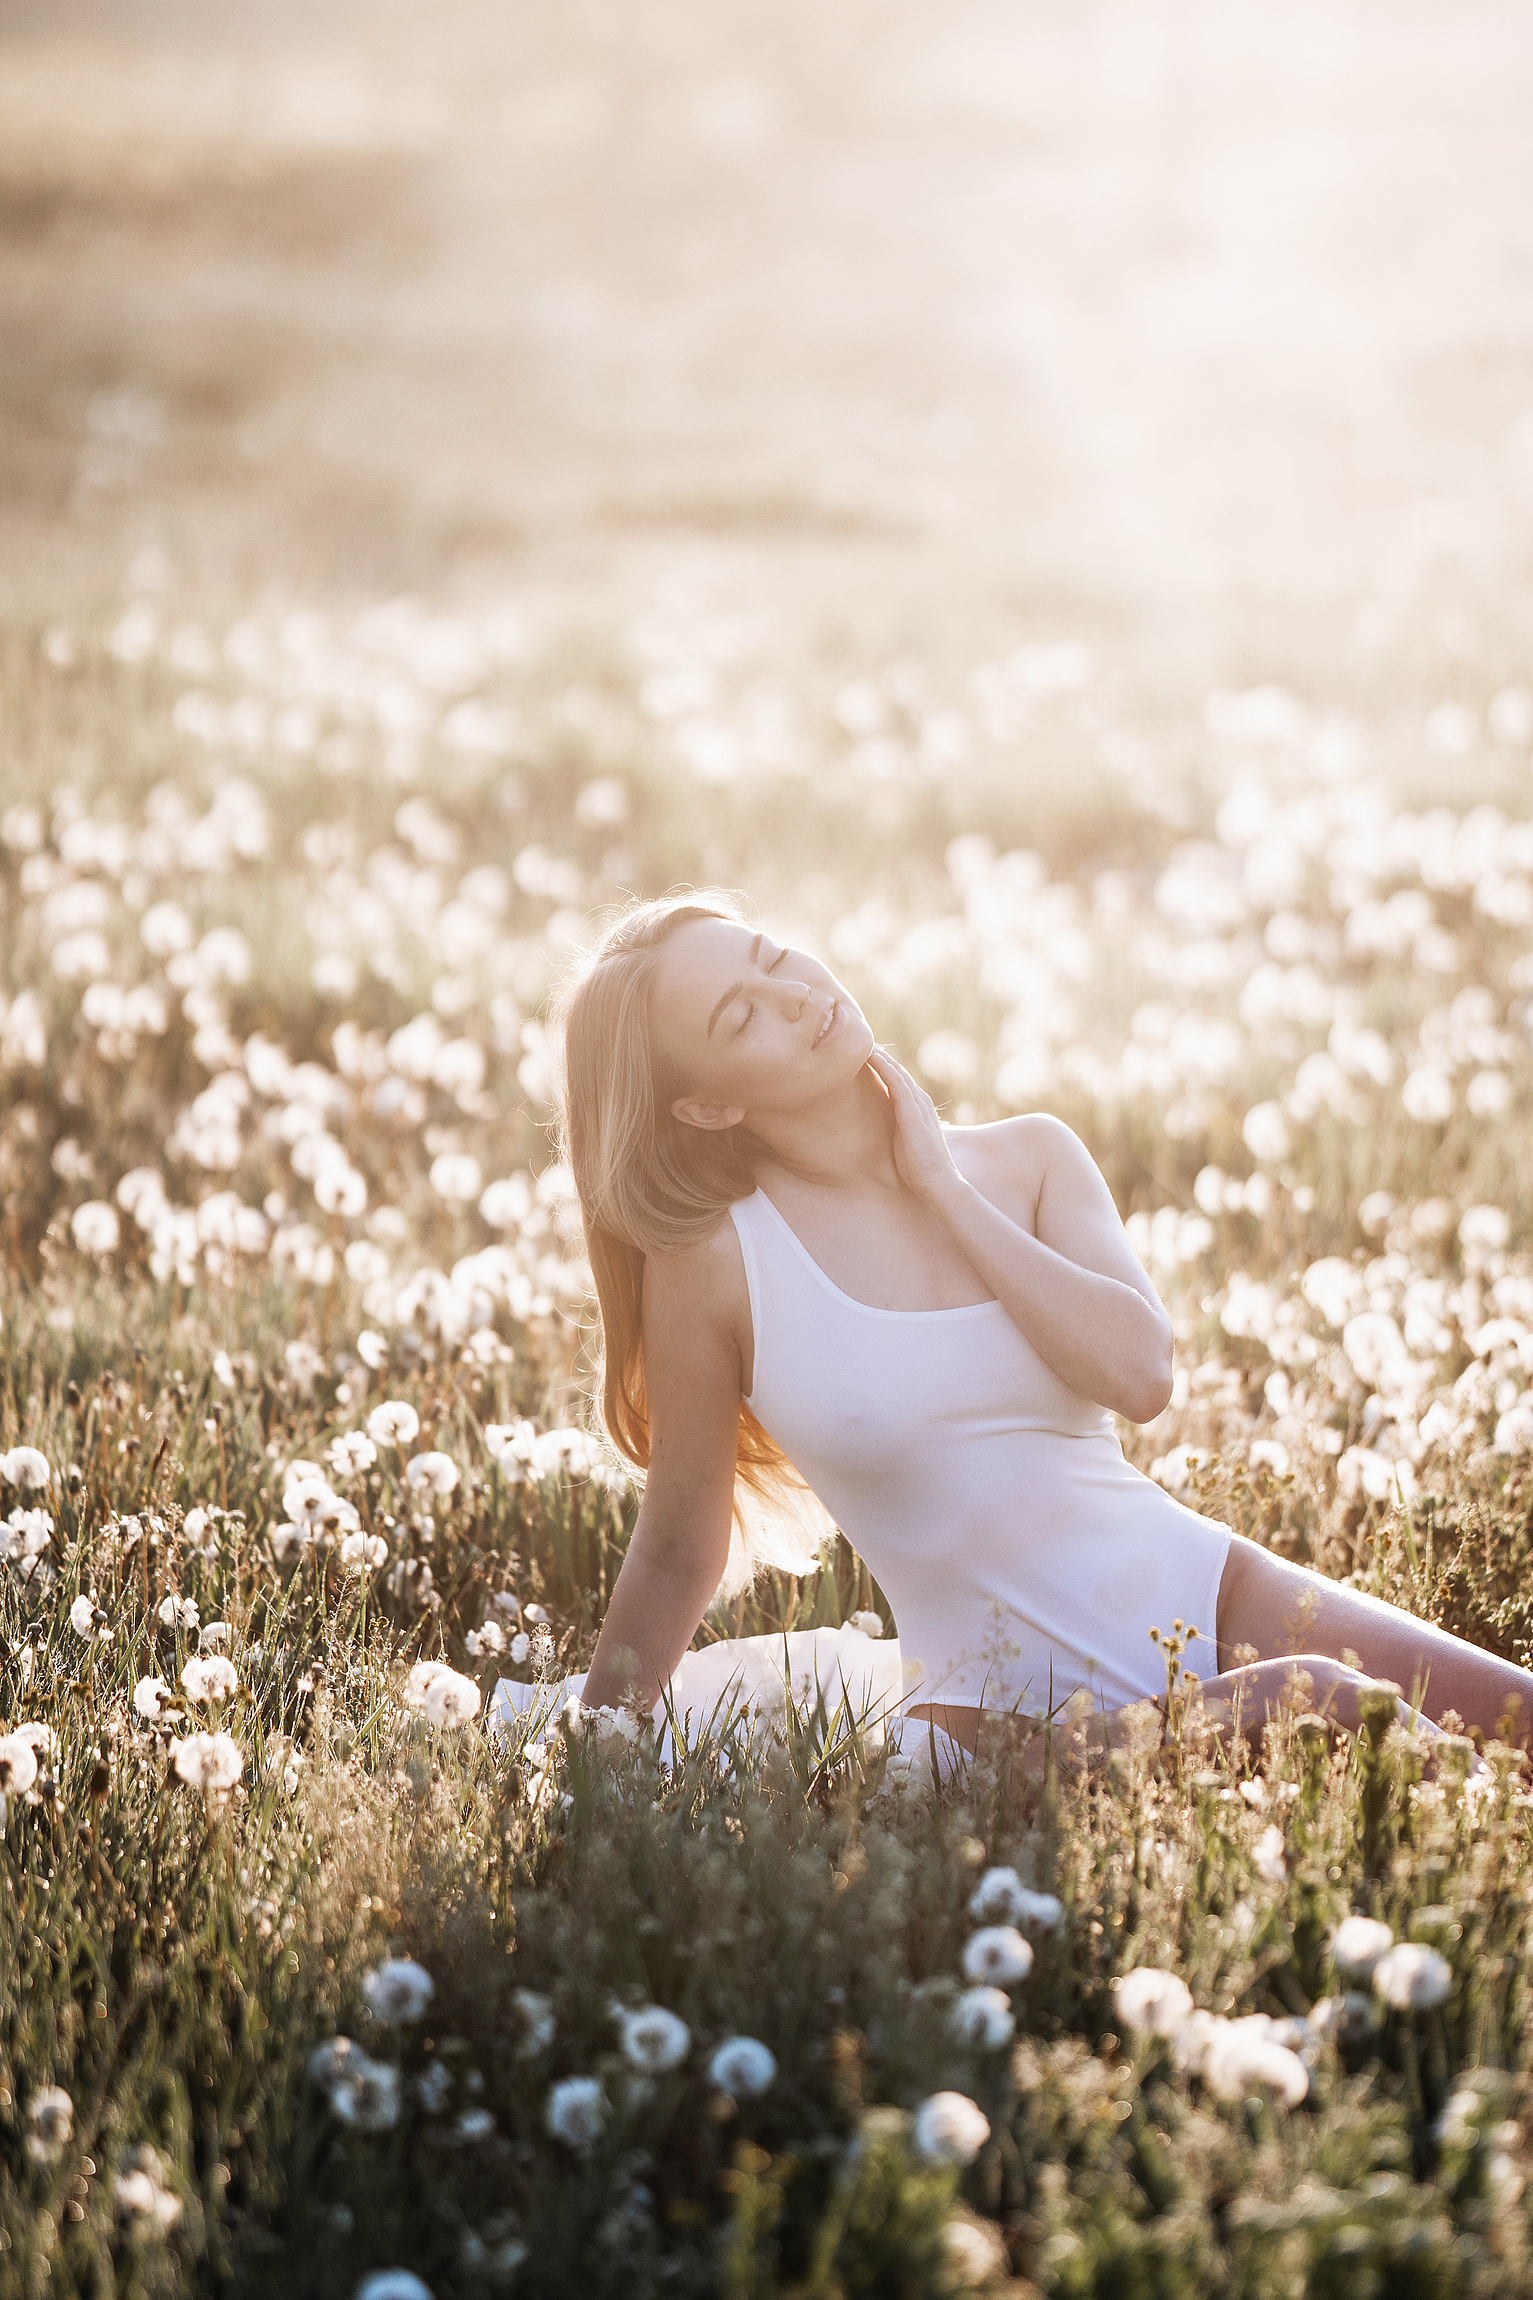 Мой Мир - мои правила / фотограф Photographyzp Yana